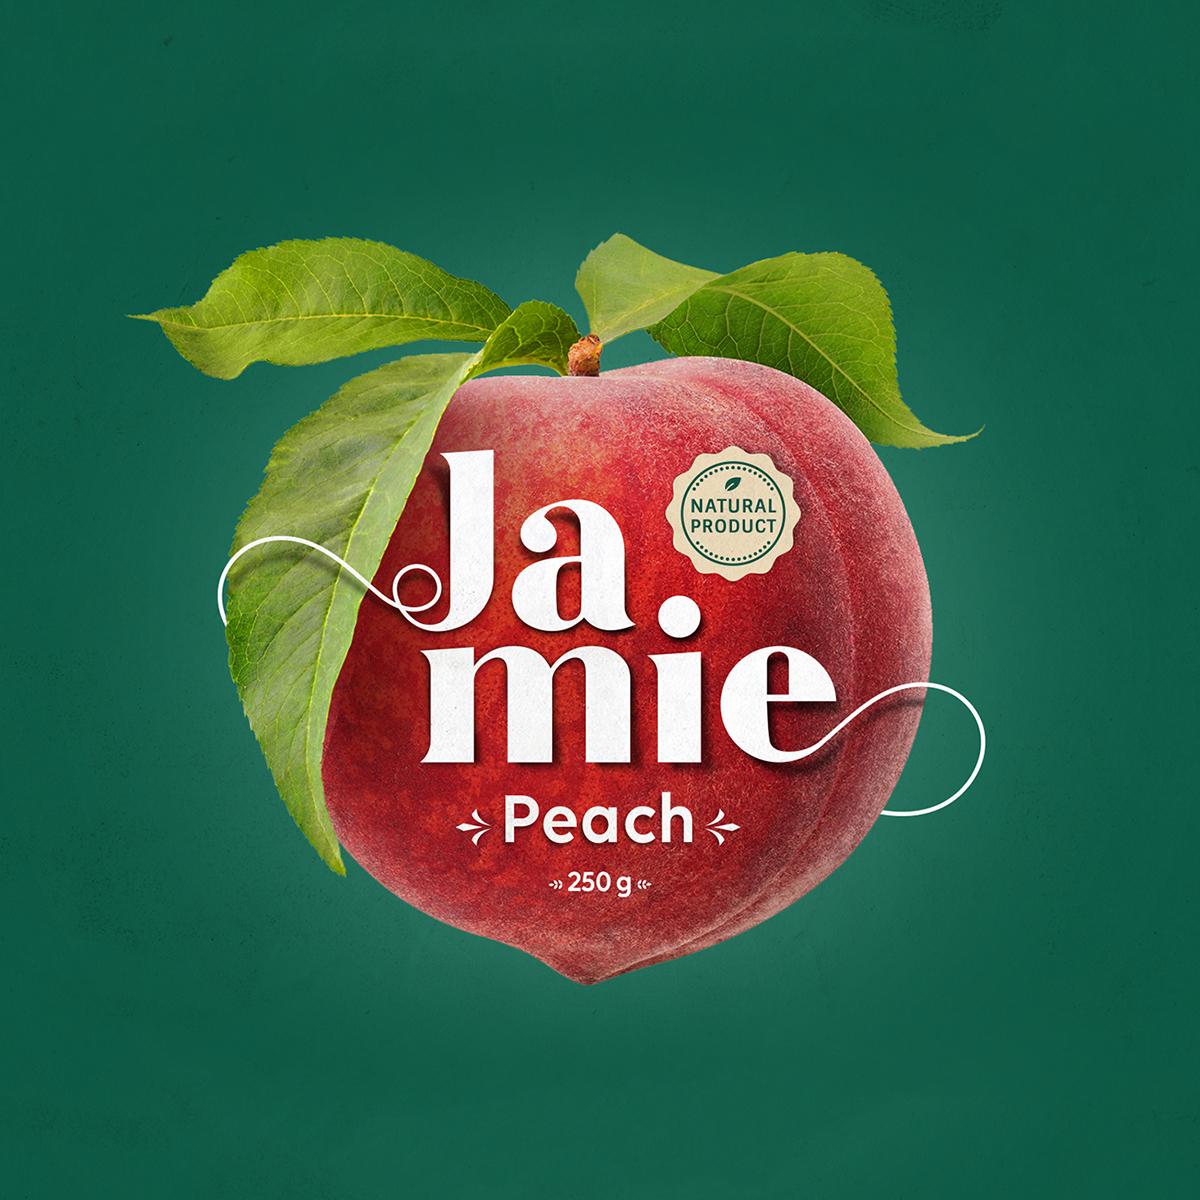 Jamie Jam Packaging Design by Mohammed Mounir